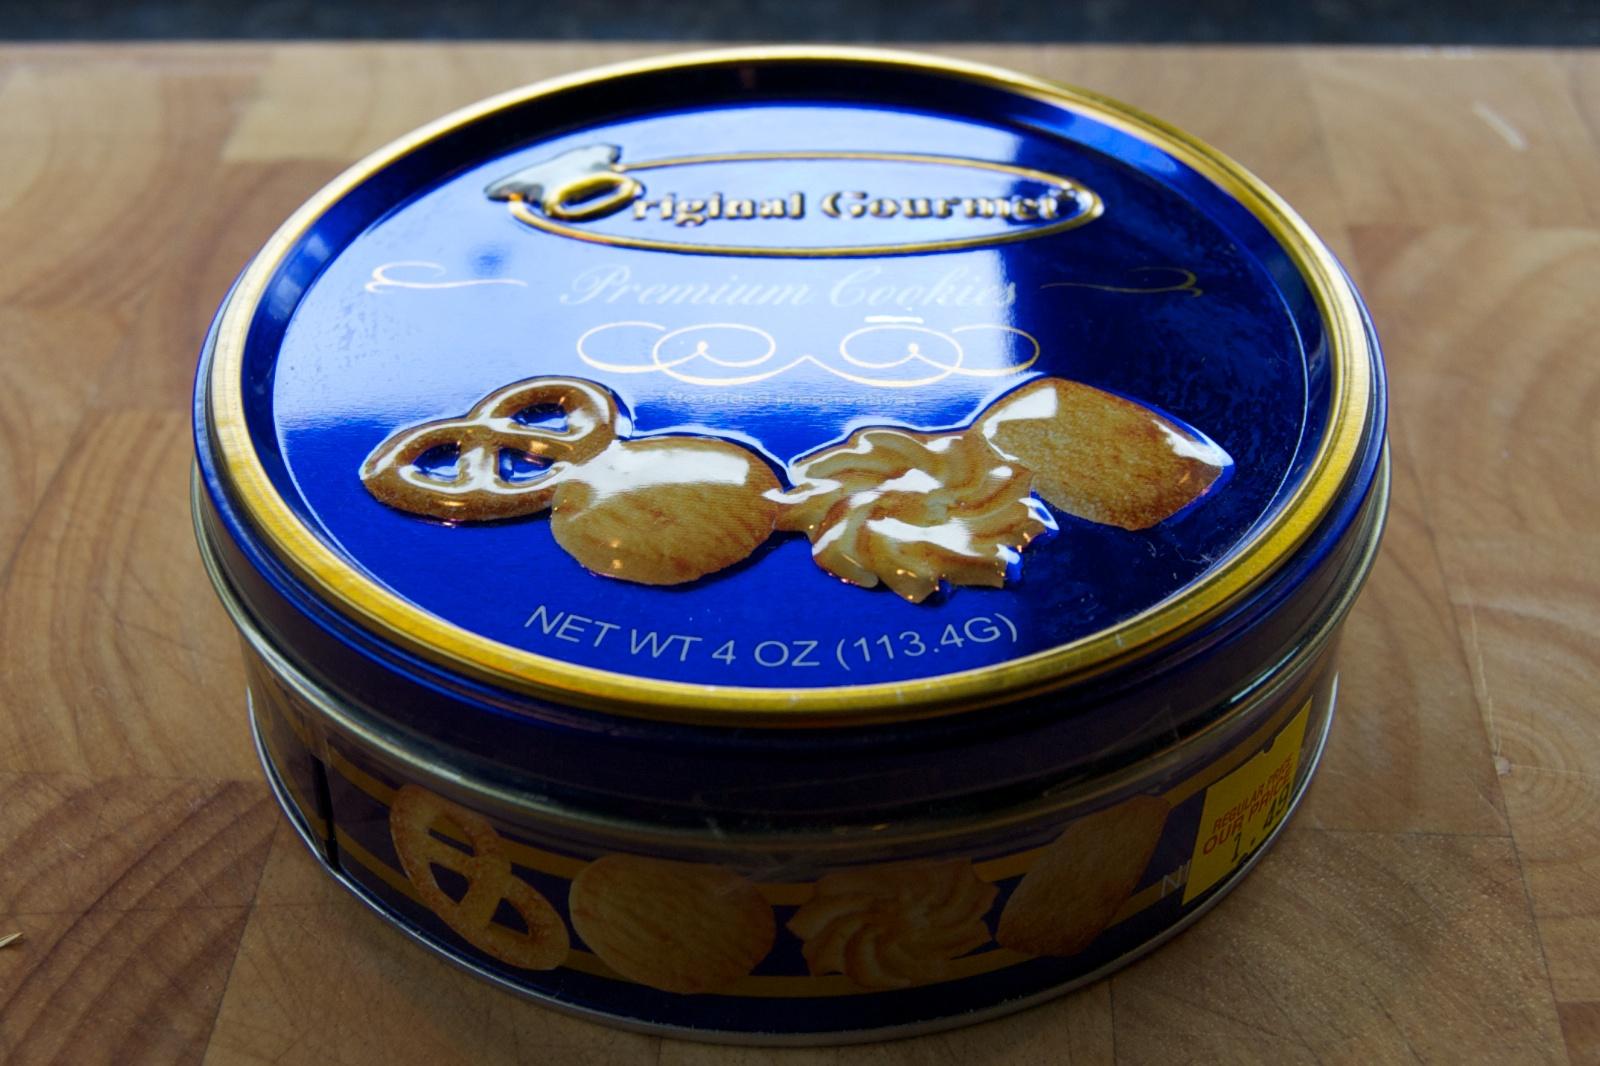 http://blog.rickk.com/food/2011/06/22/cookies1.jpg